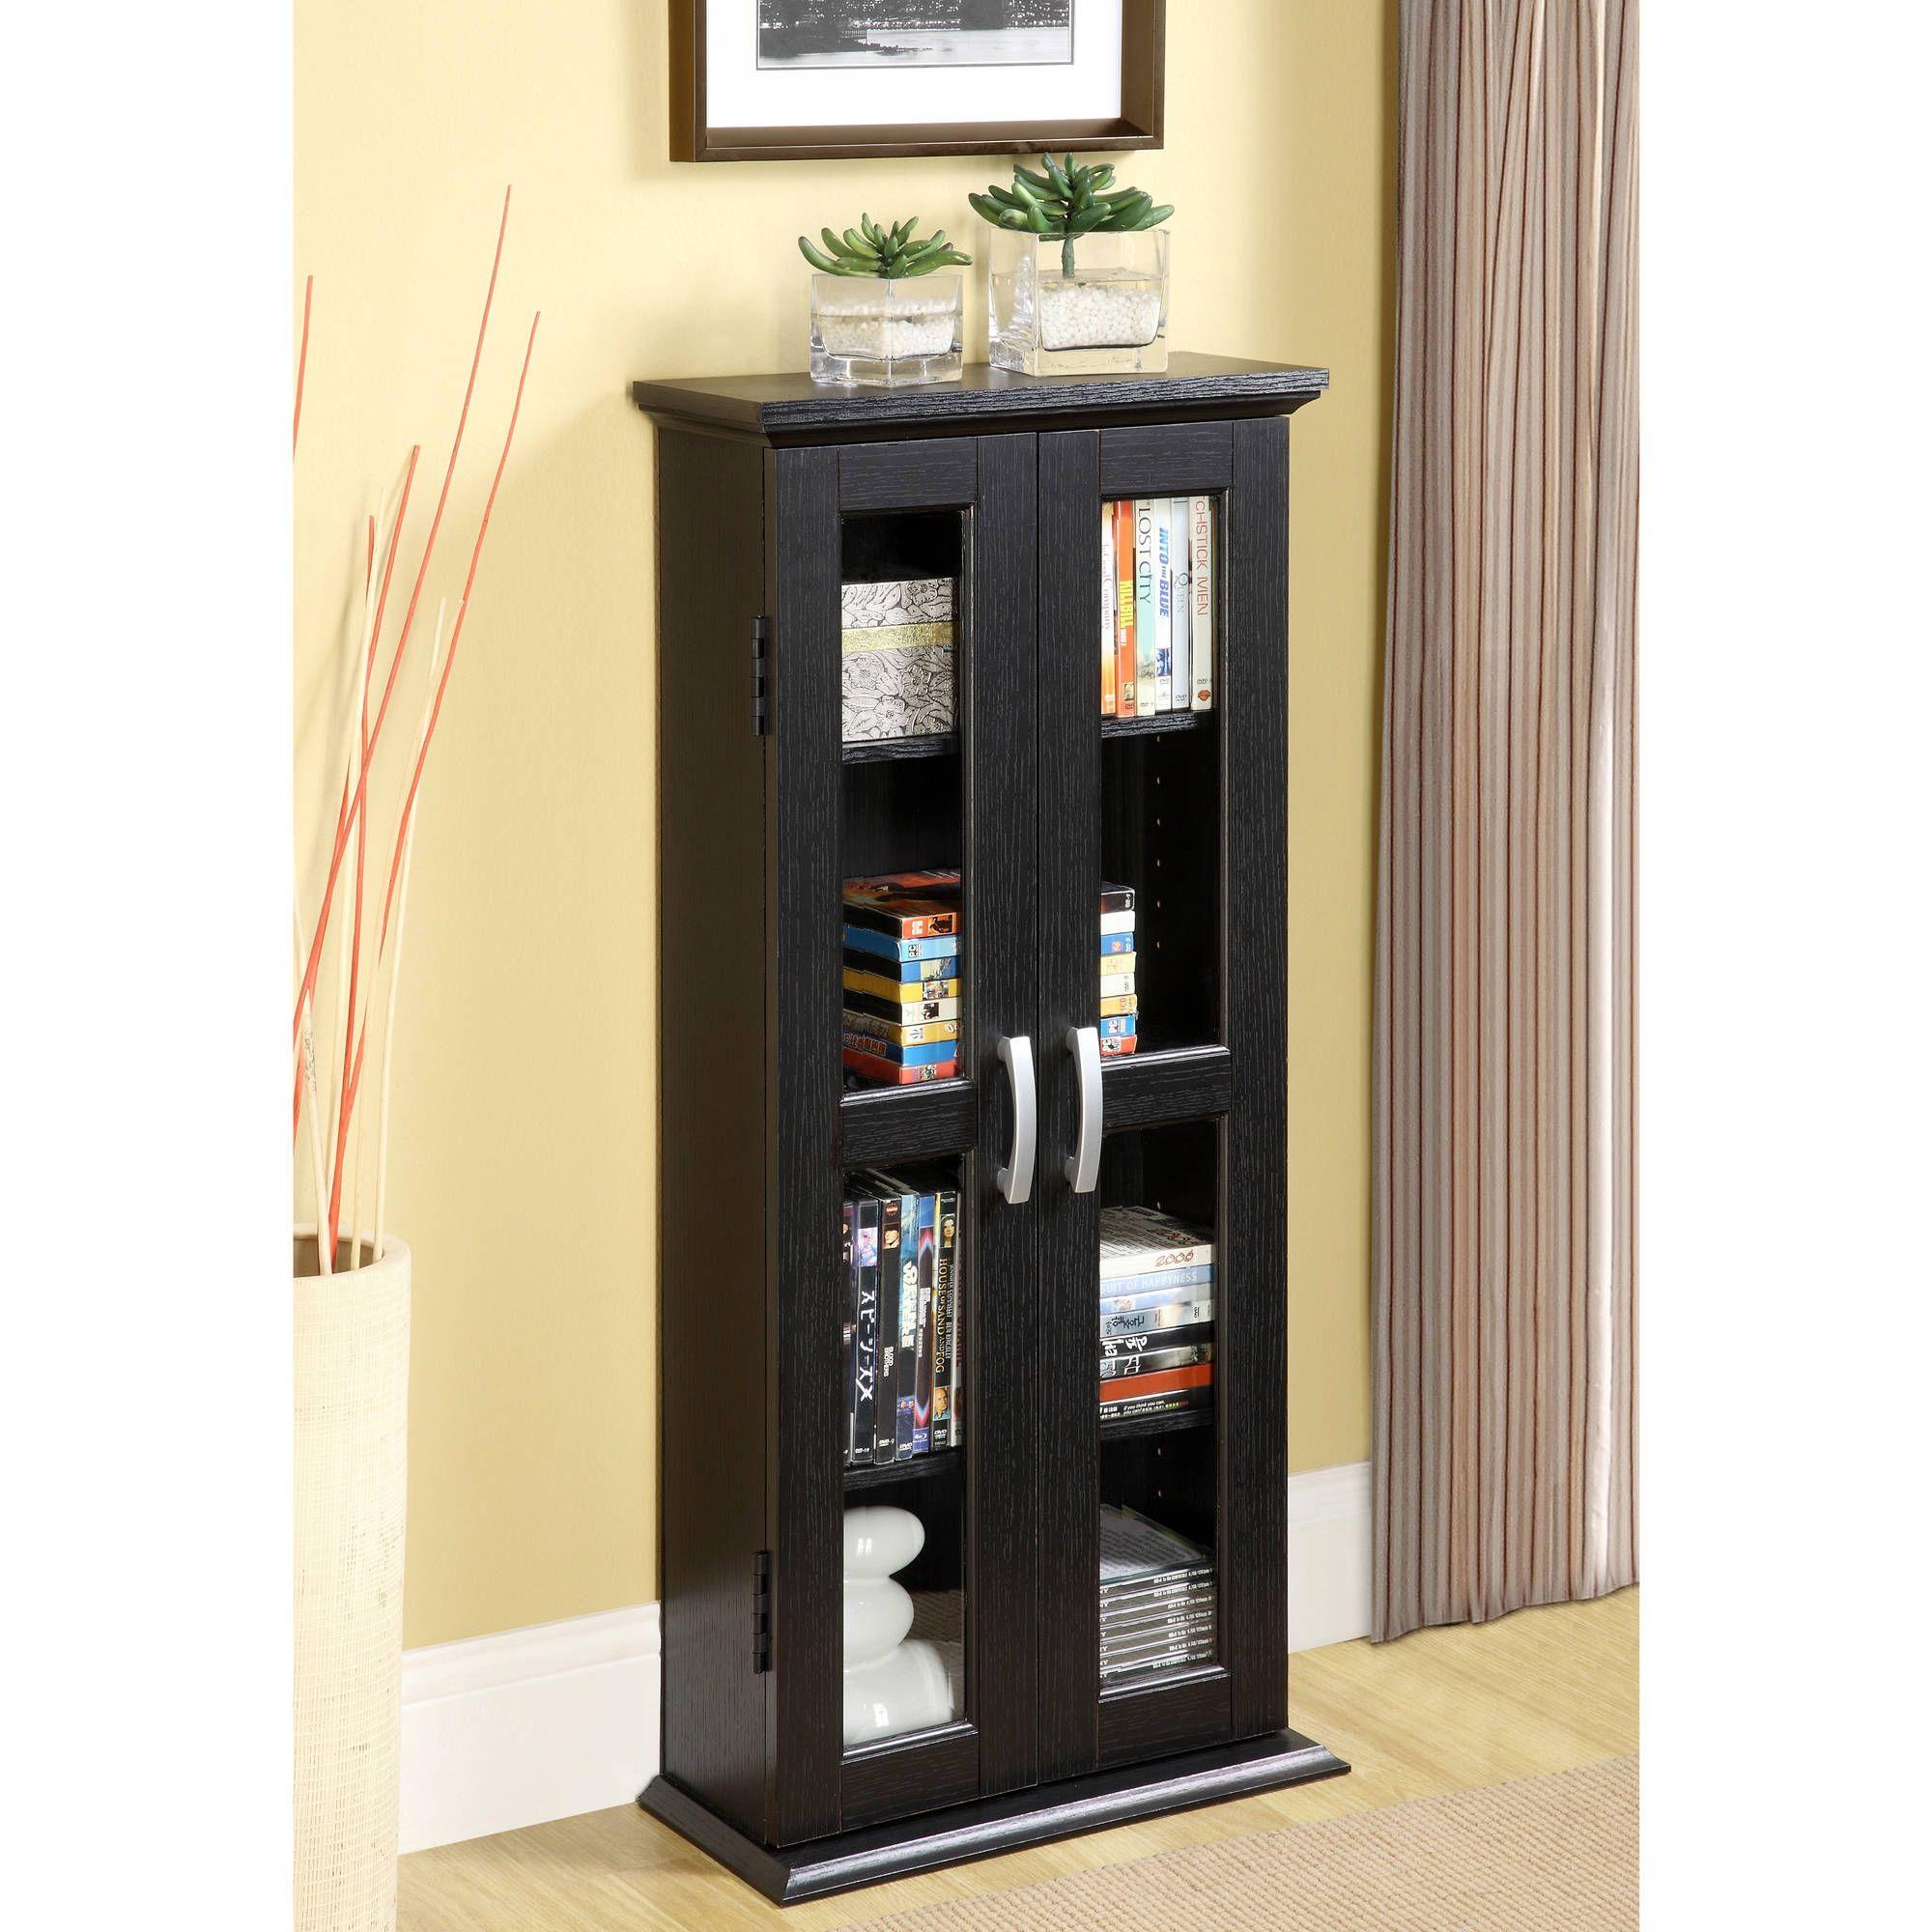 Cd Dvd Storage Cabinets Wood Httpdivulgamaisweb Pinterest